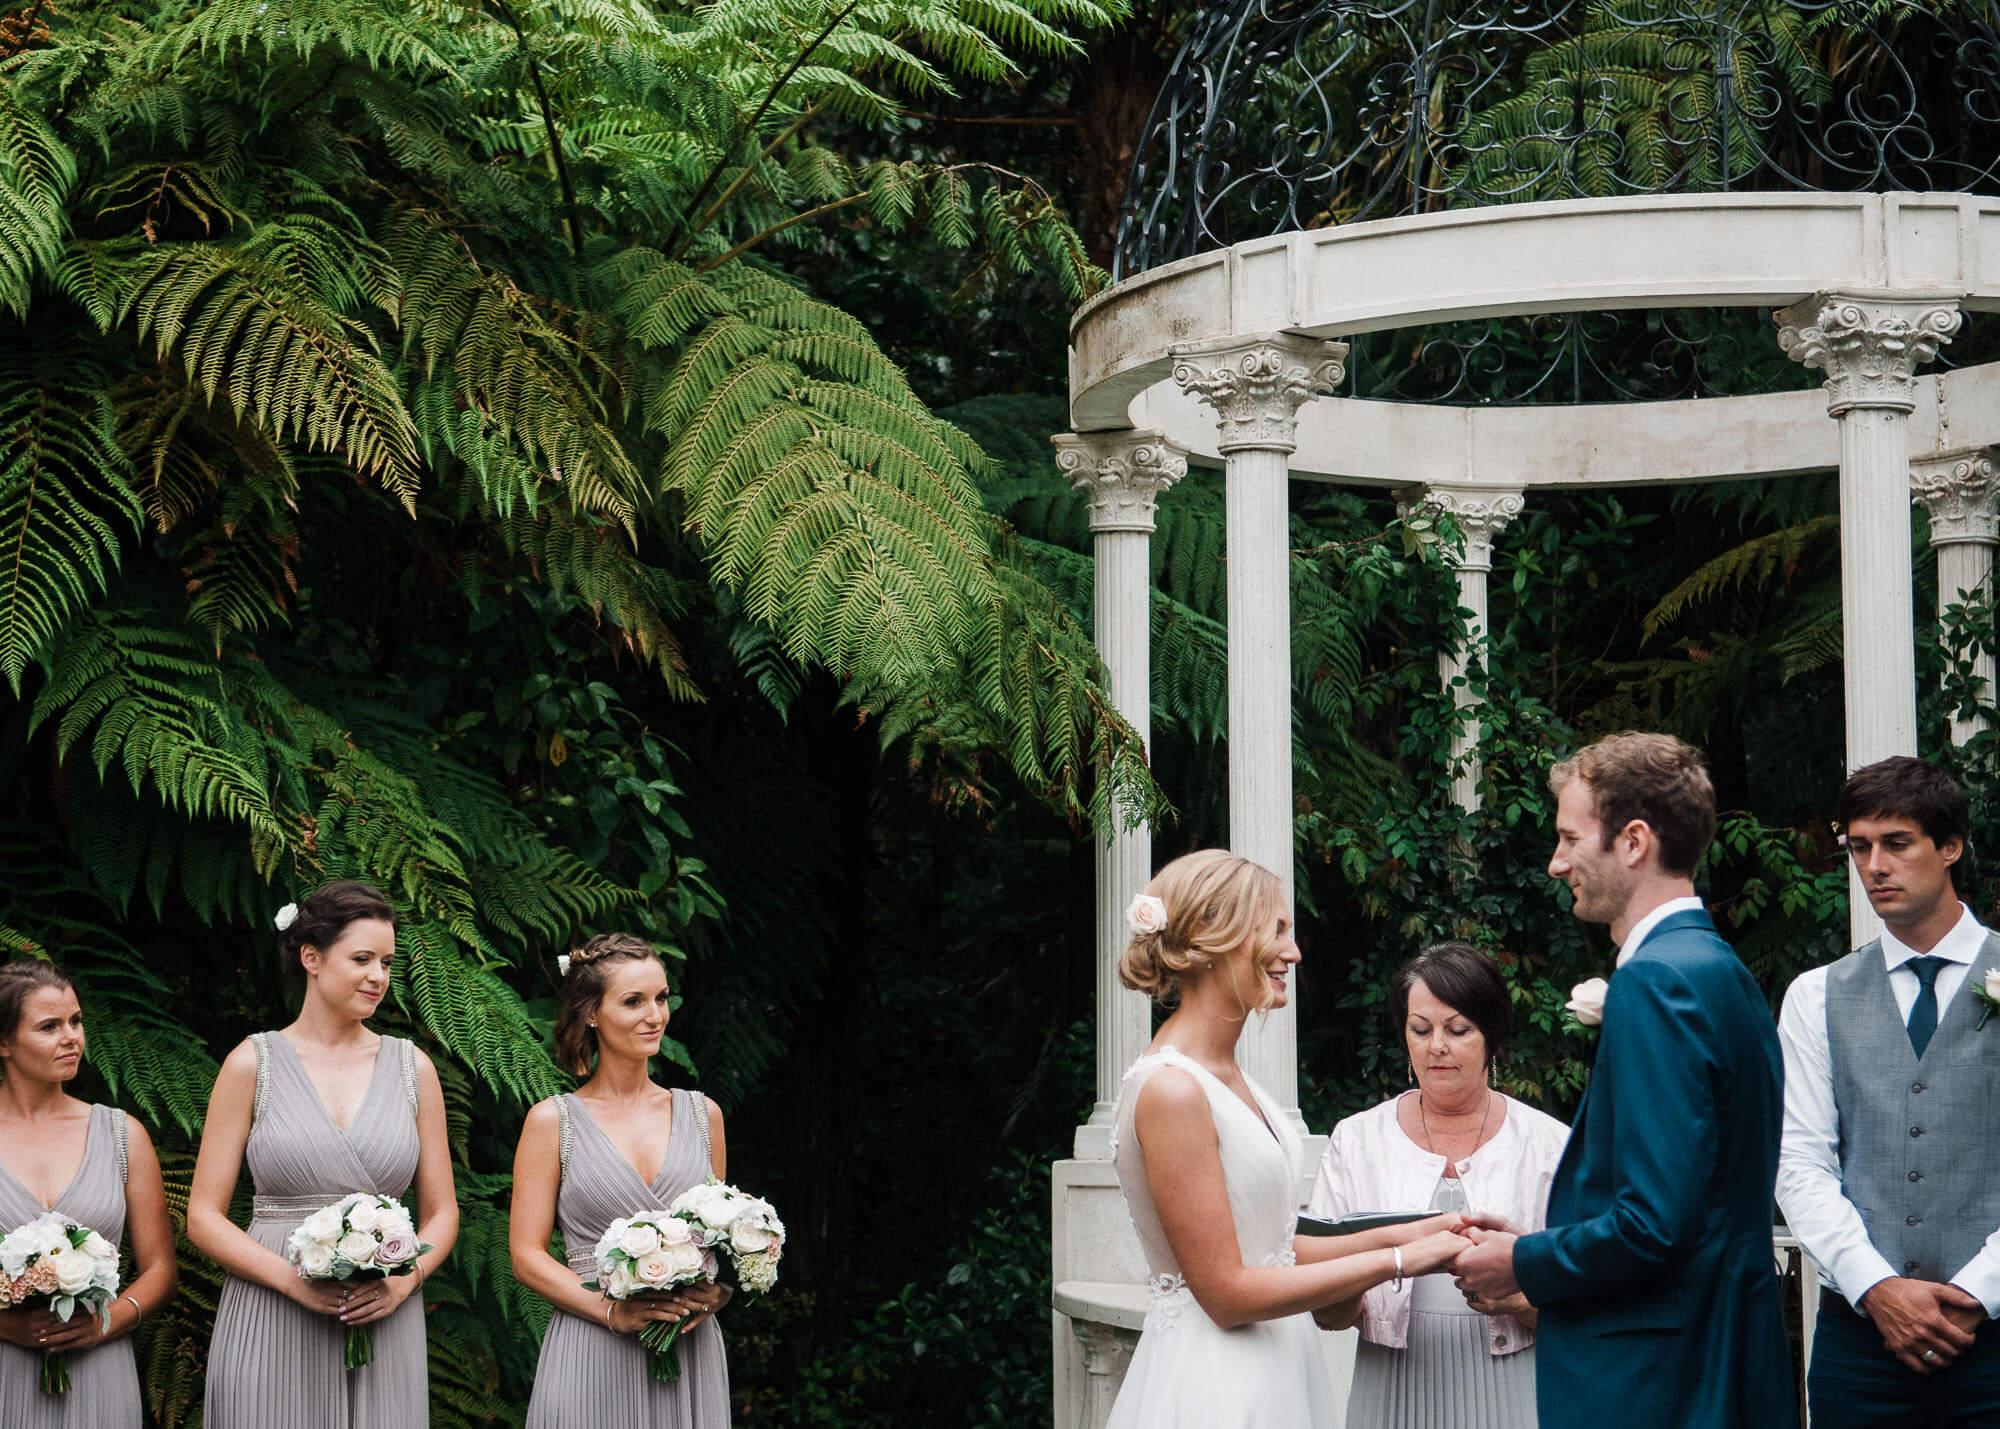 garden-wedding-ceremony.jpg